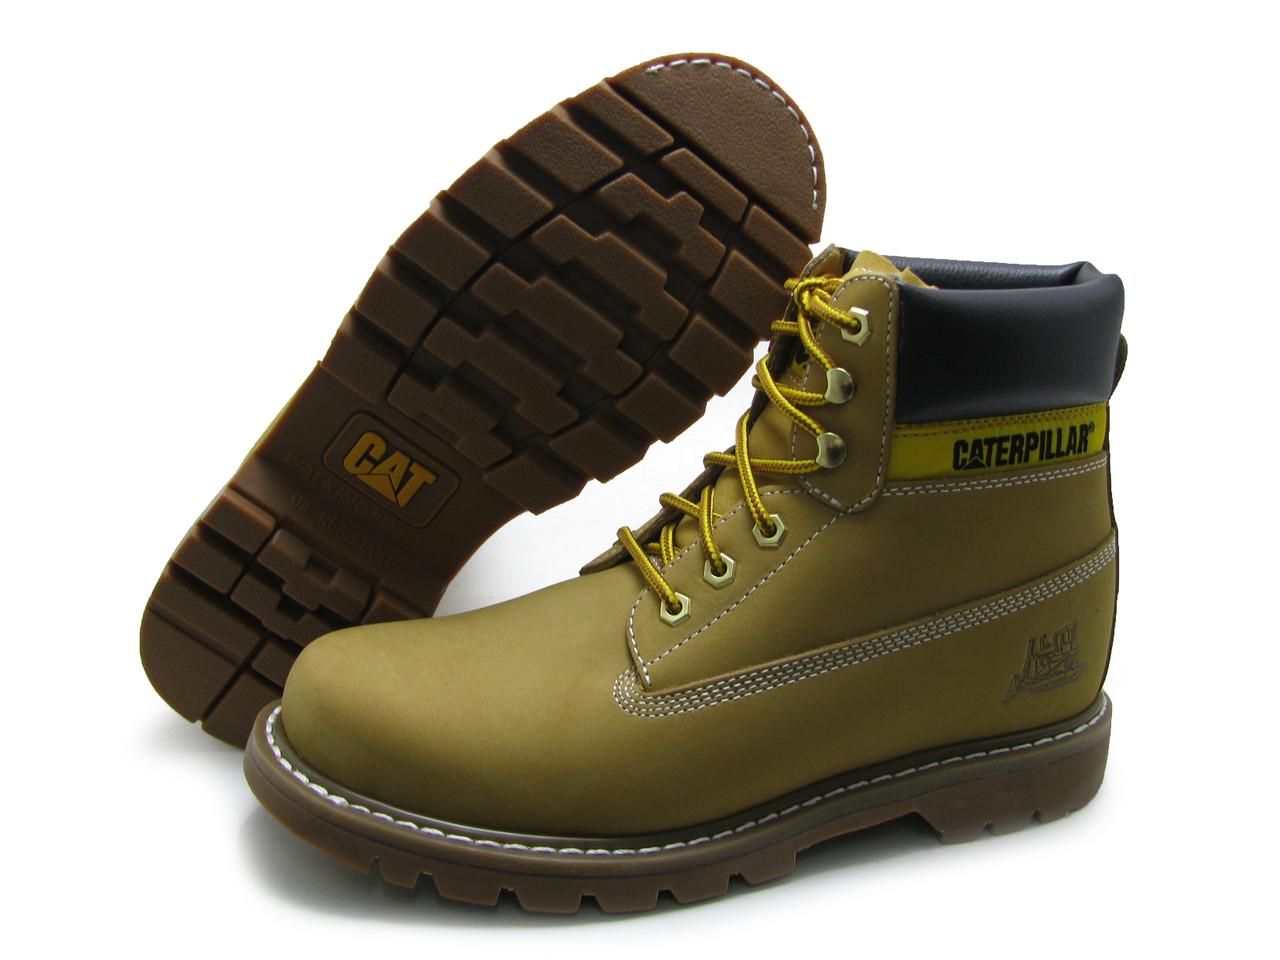 Ботинки мужские Caterpillar Winter Leisure Boots Colorado